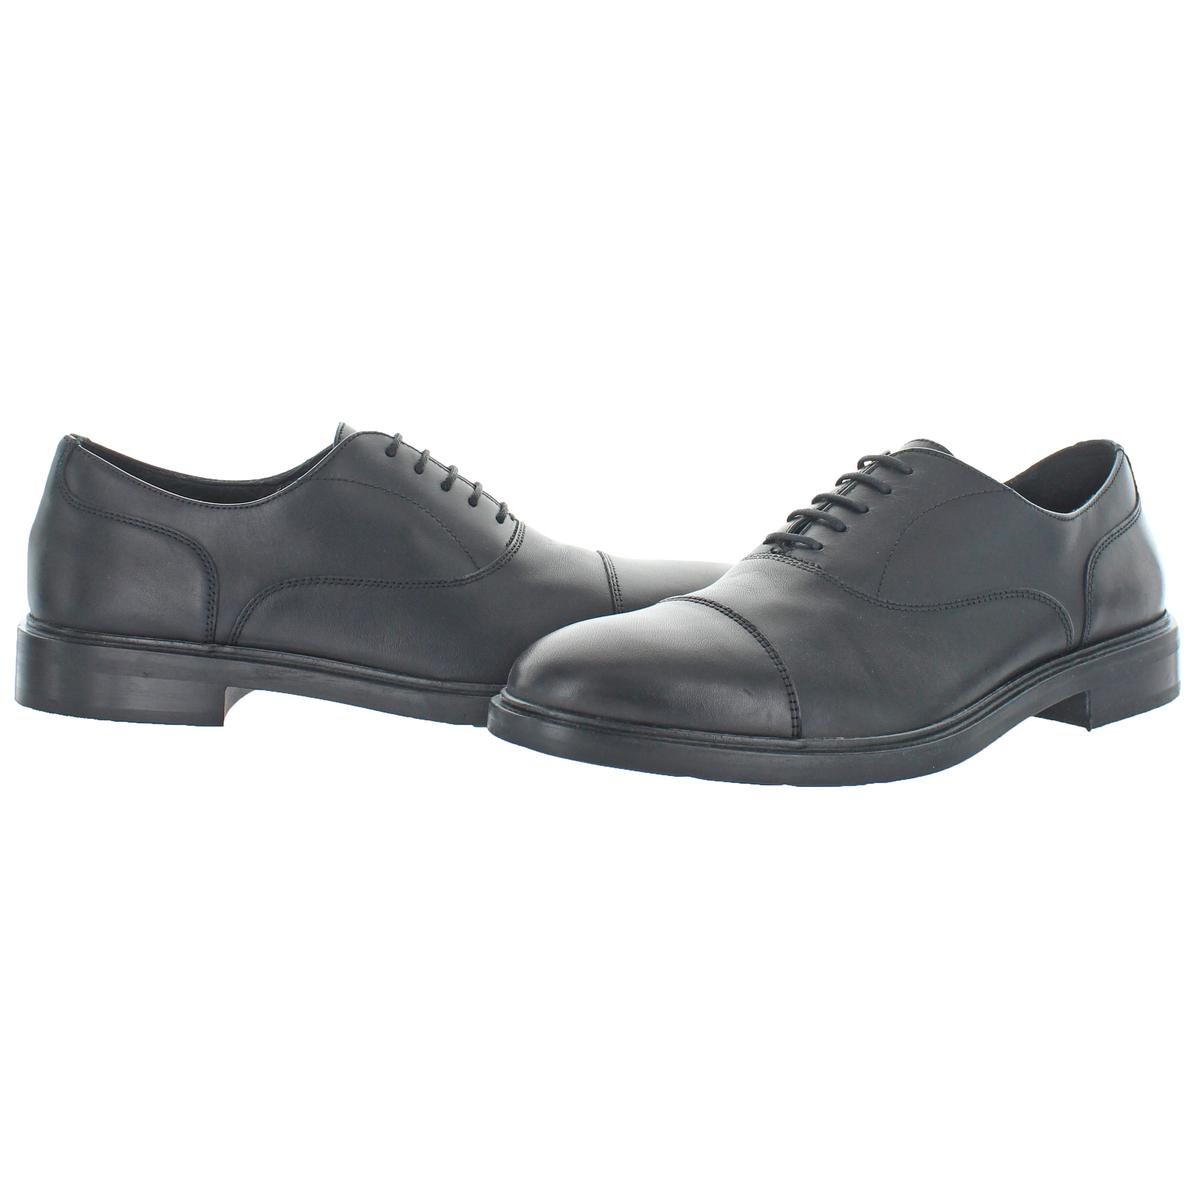 montar Planta caja de cartón  Geox Respira Mens Curtwain Leather Lace Up Cap Toe Oxfords Shoes BHFO 4858  | eBay